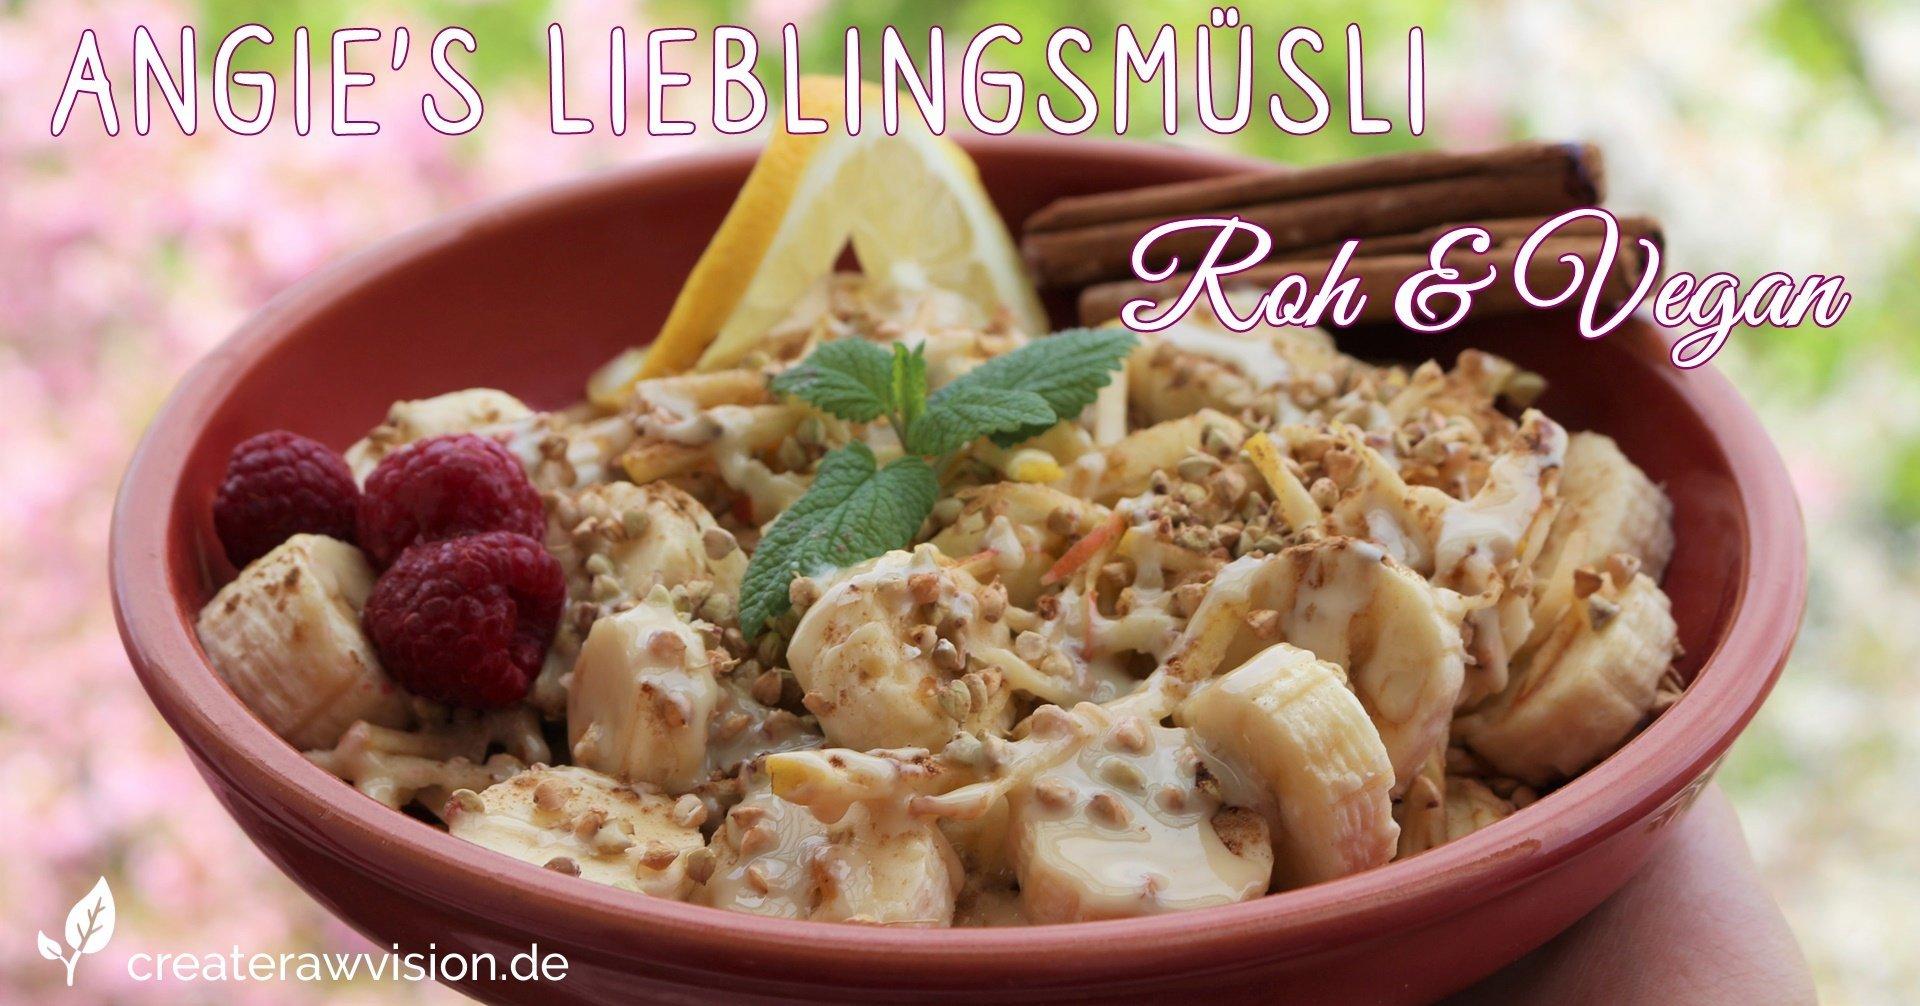 Angies Lieblingsmüsli Roh & Vegan mit Bananen, Äpfel, Himbeeren und Buchweizen